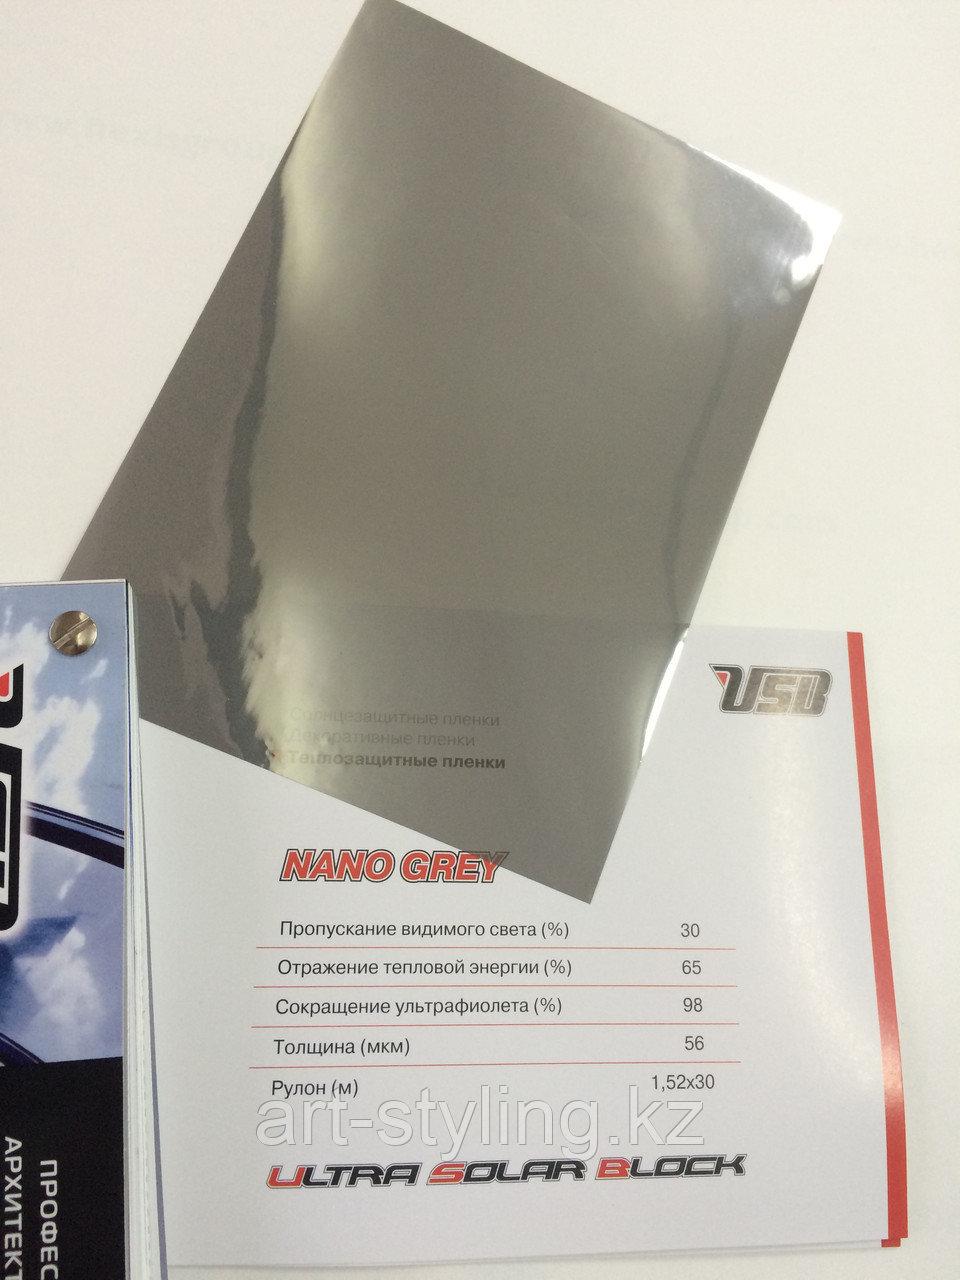 Теплоотражающая пленка Nano Grey 30% (серый)